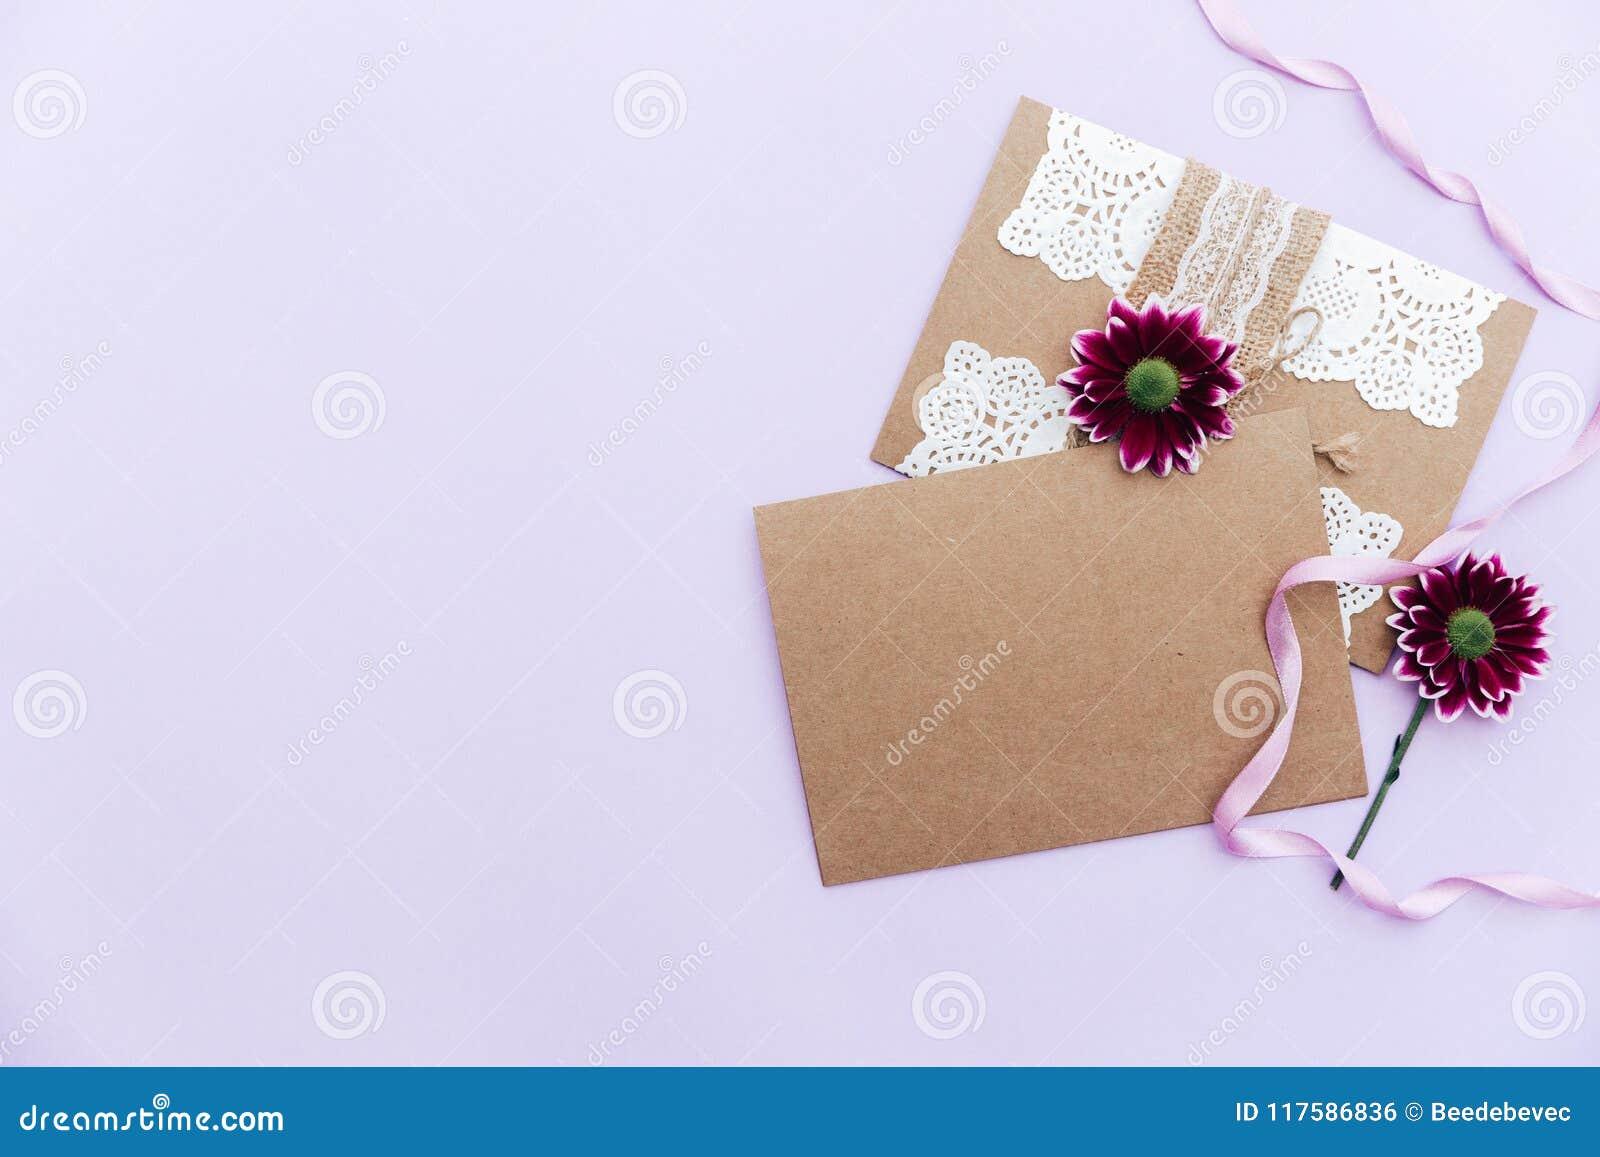 Wedding Invitation Greetings Card Stock Photo Image Of